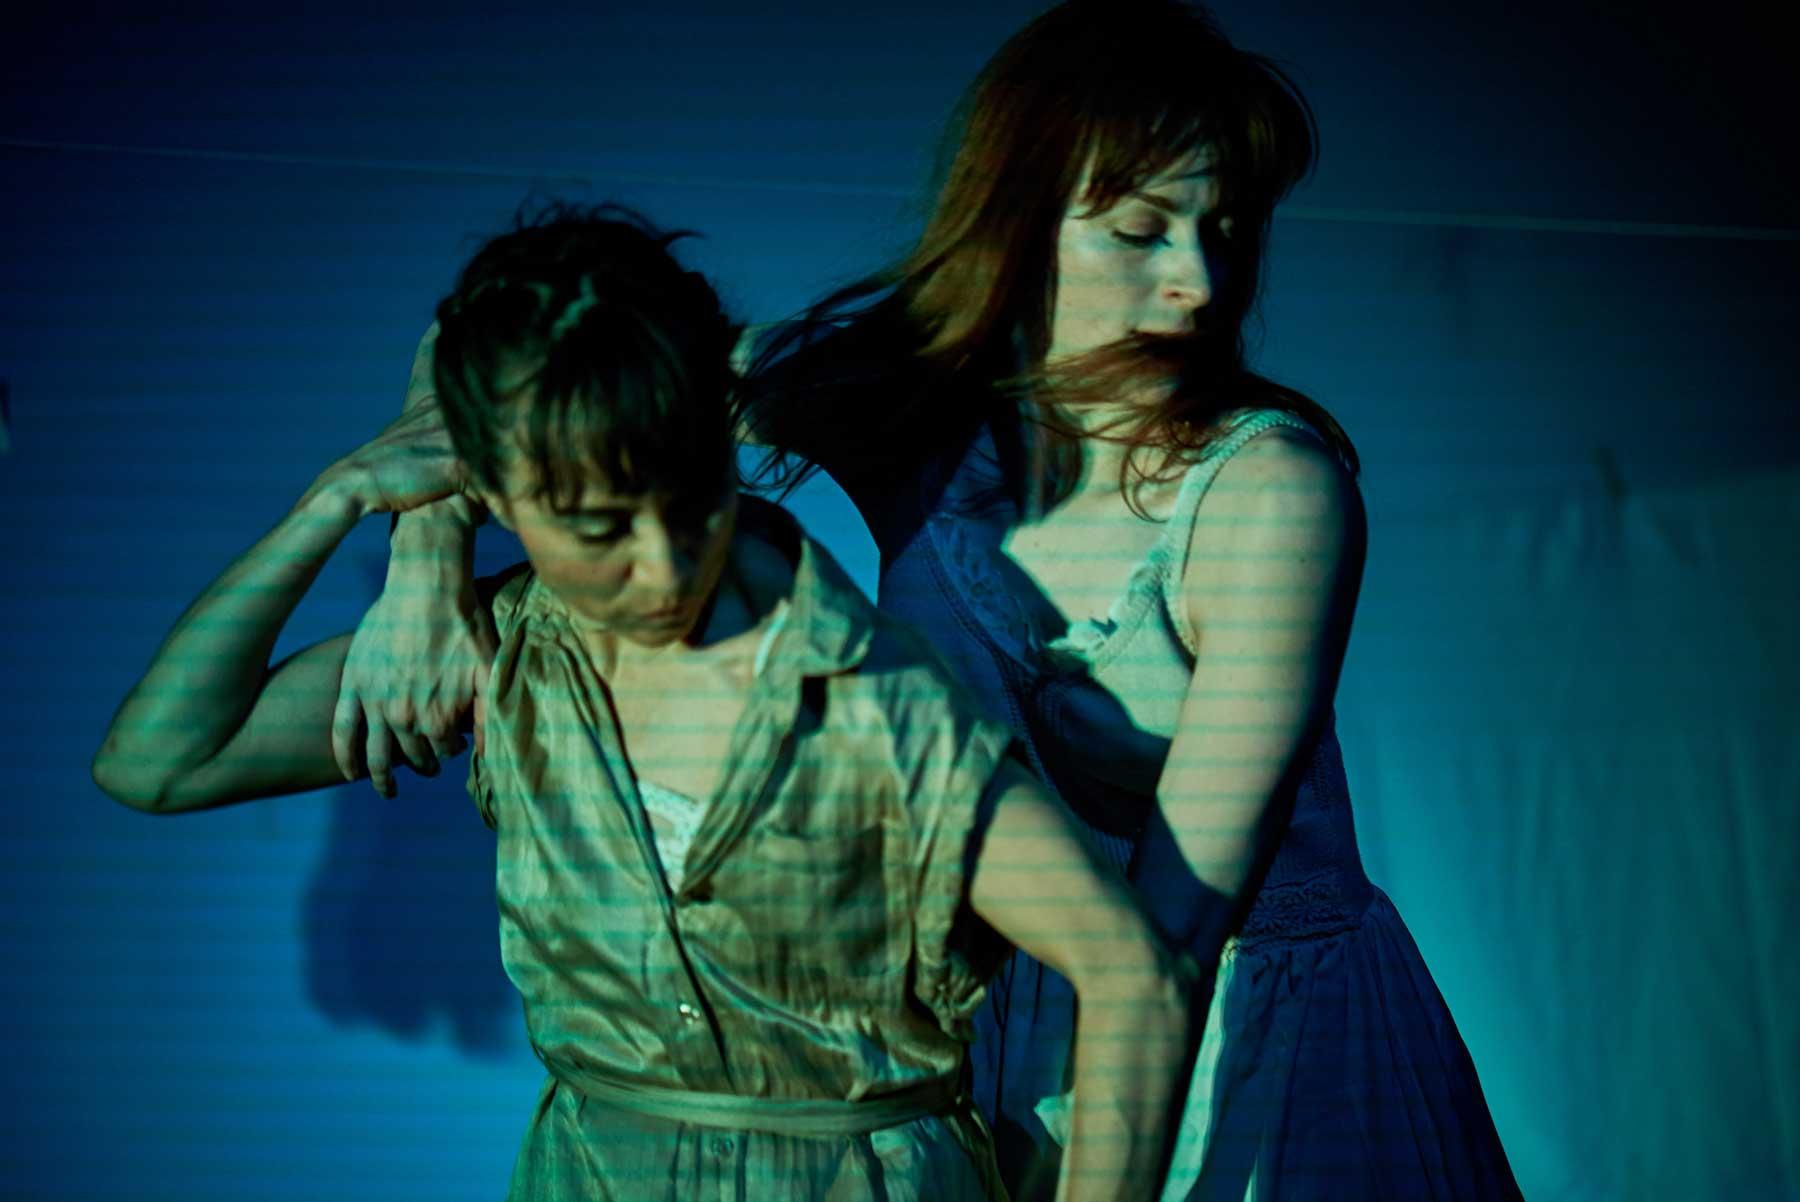 mardi-culturel-td-danse-danse-kyra-jean-green-trip-the-light-fantastic-10.jpg